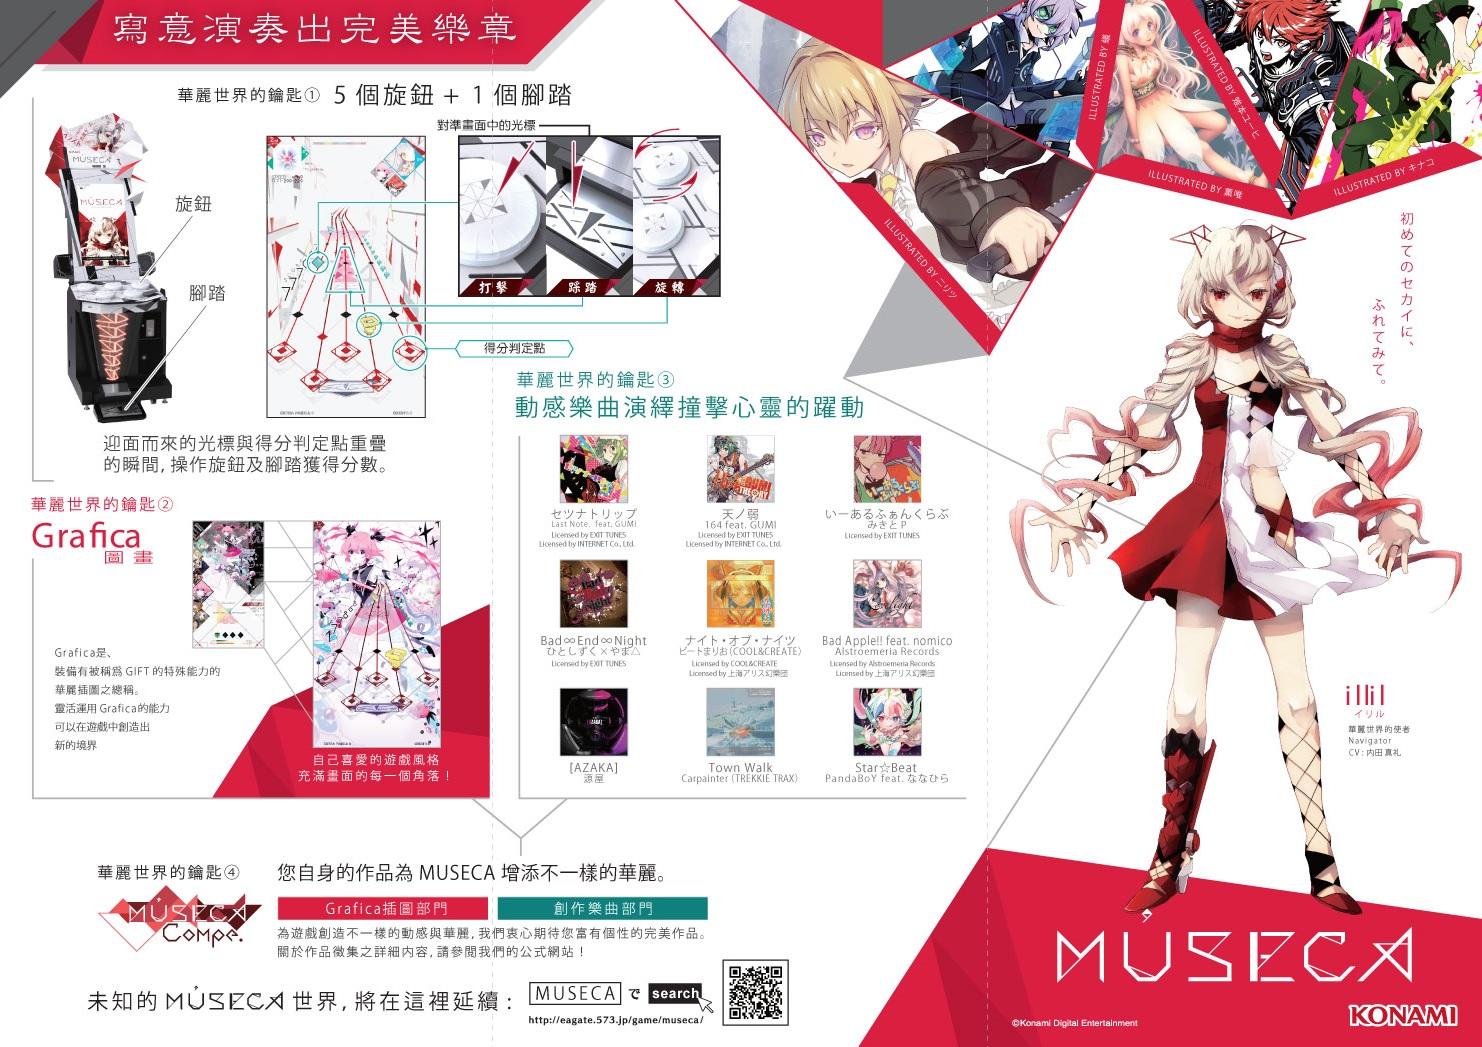 Topics List - MÚSECA | Konami Product Information